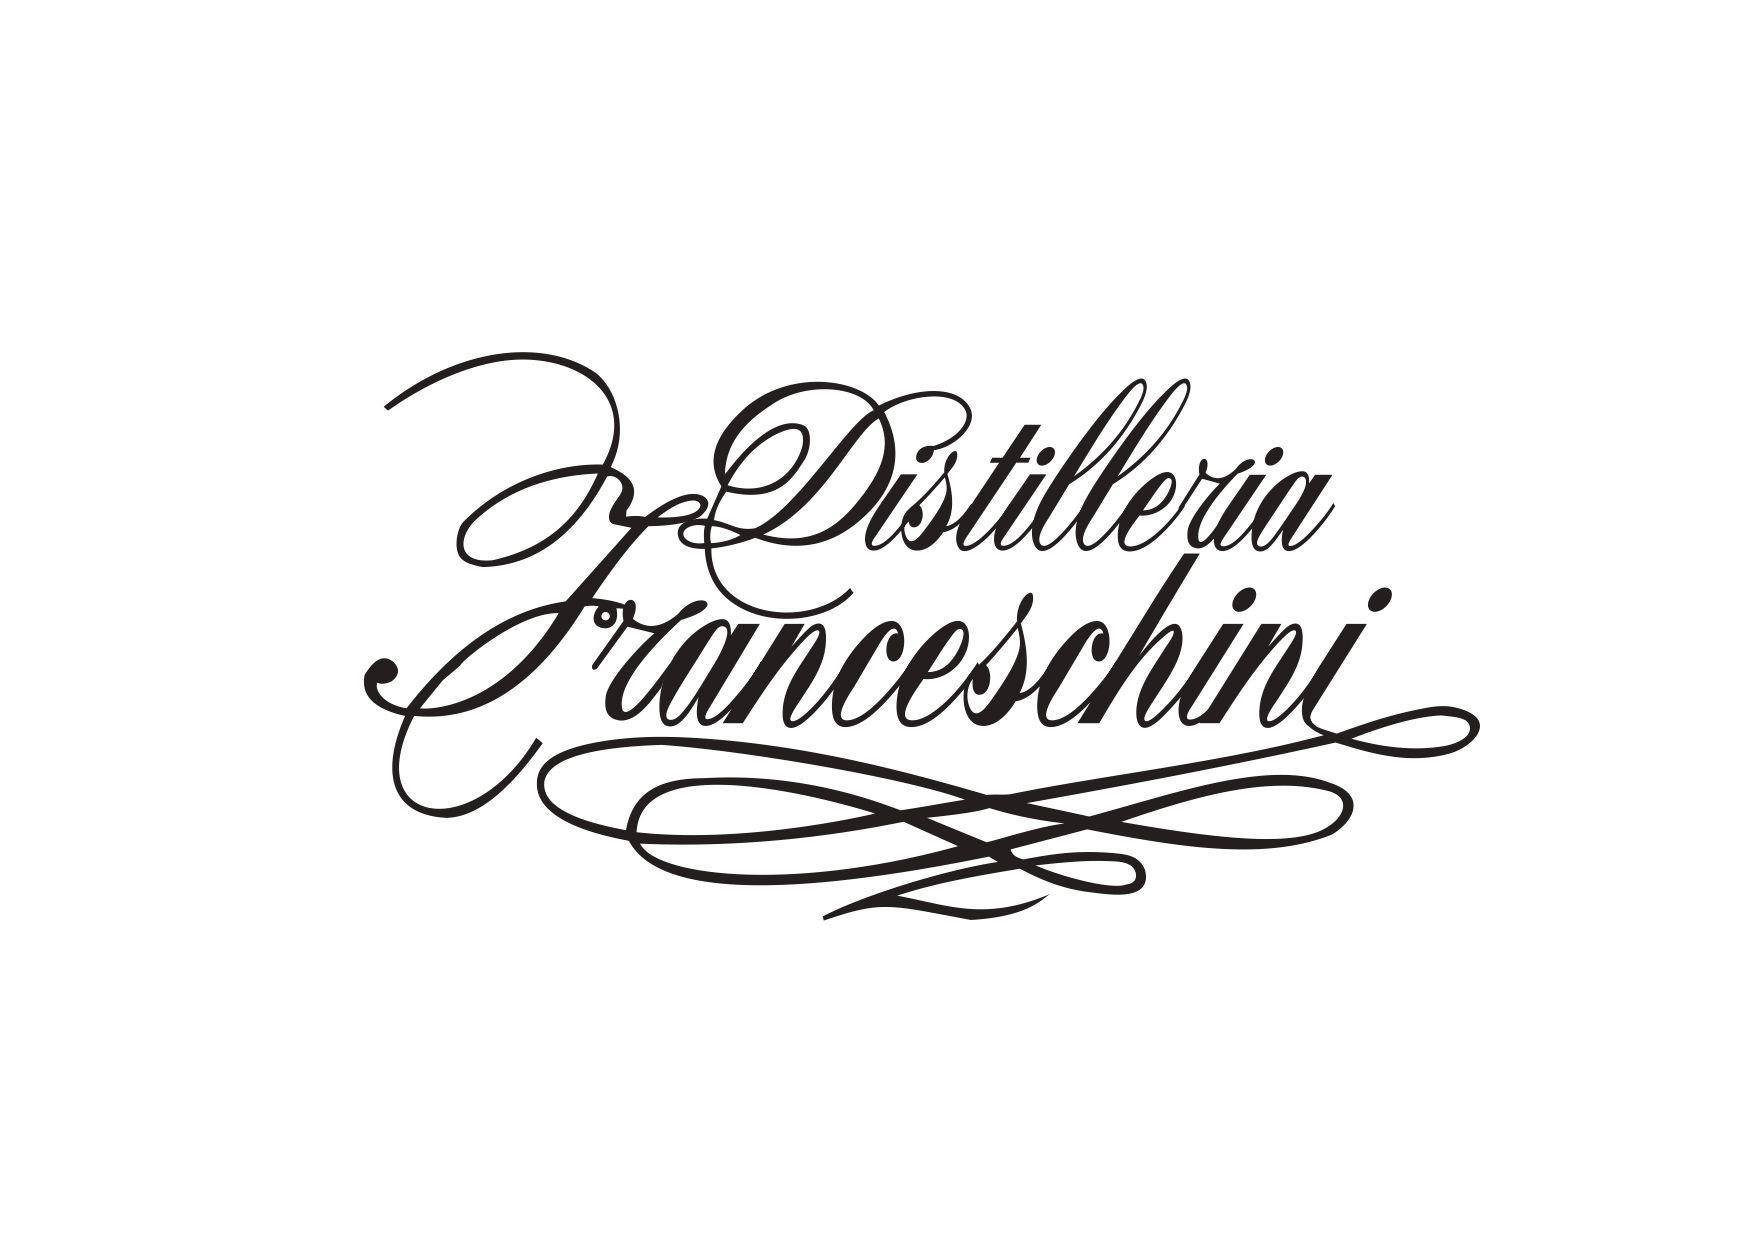 Distilleria Franceschini